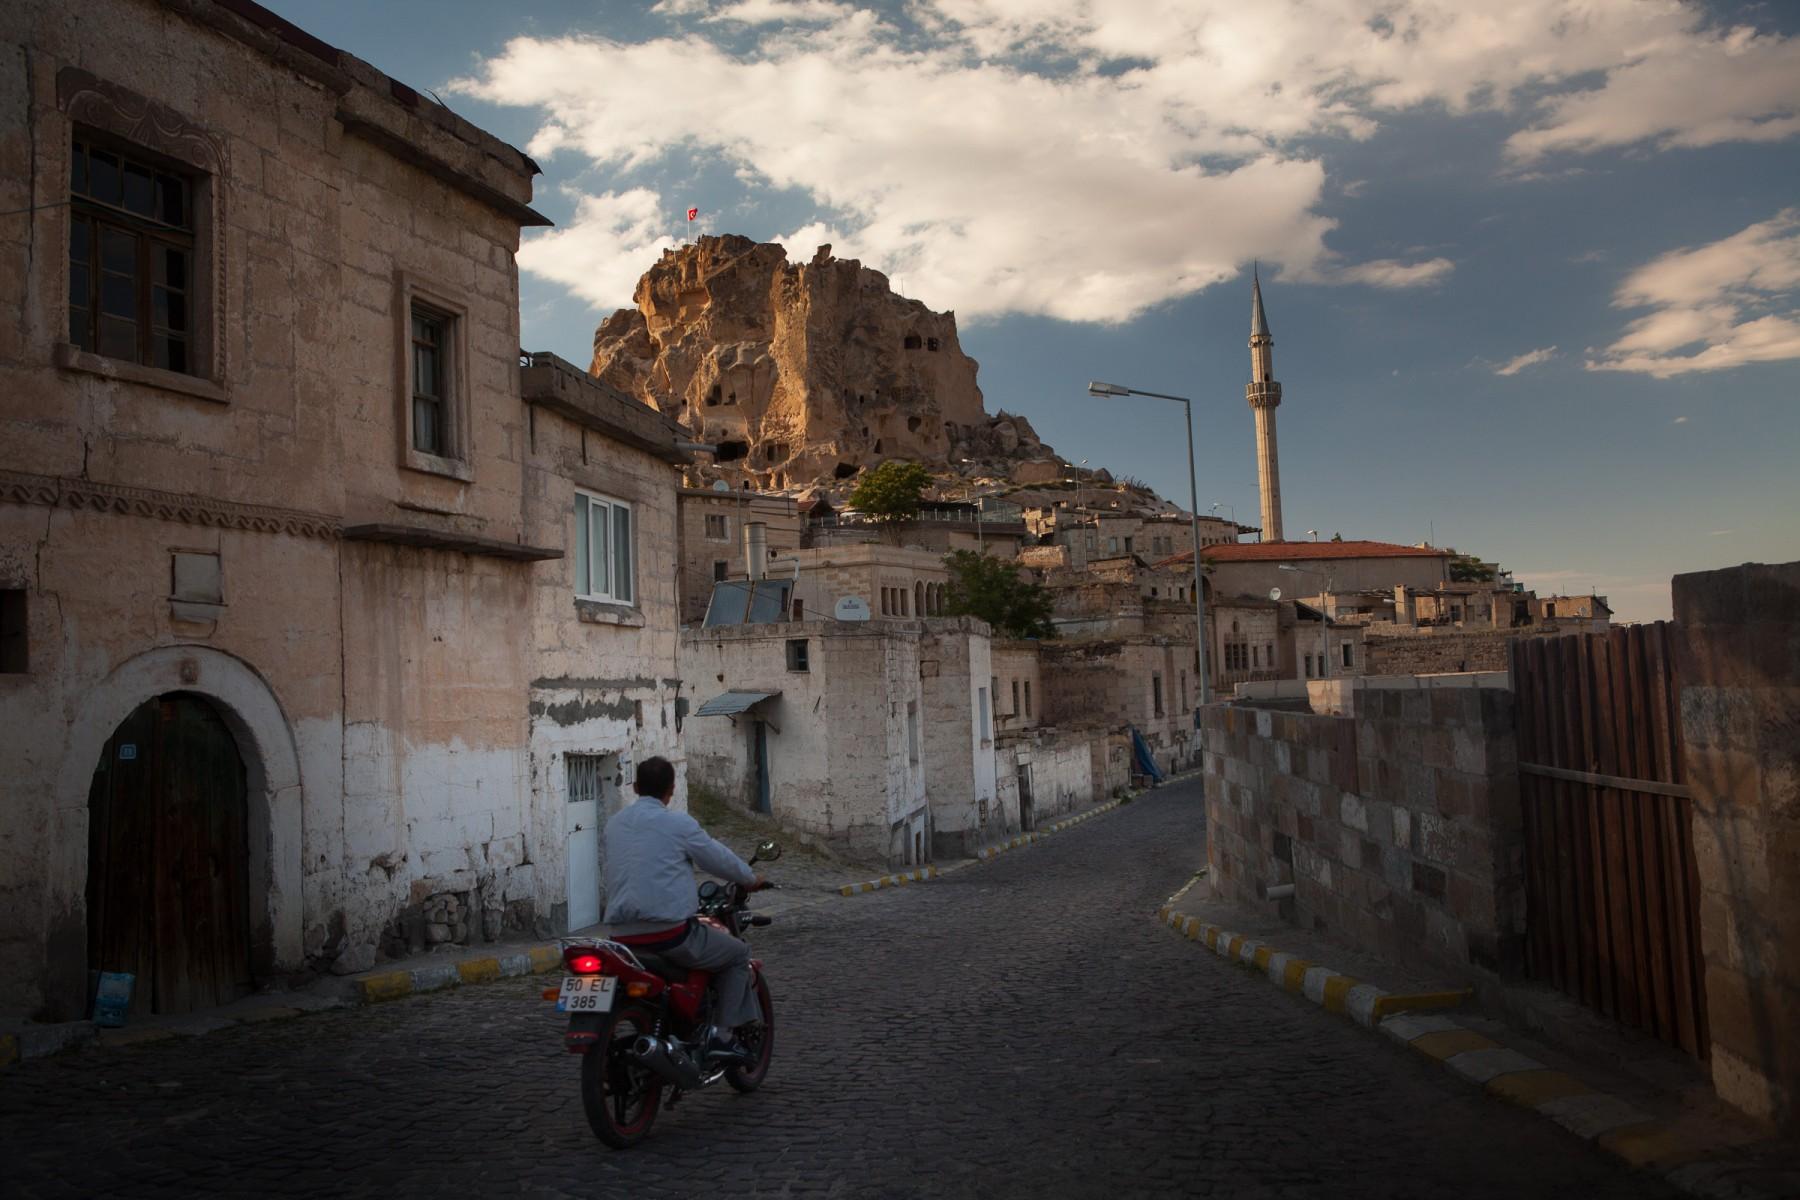 View of Üçhisar Castle